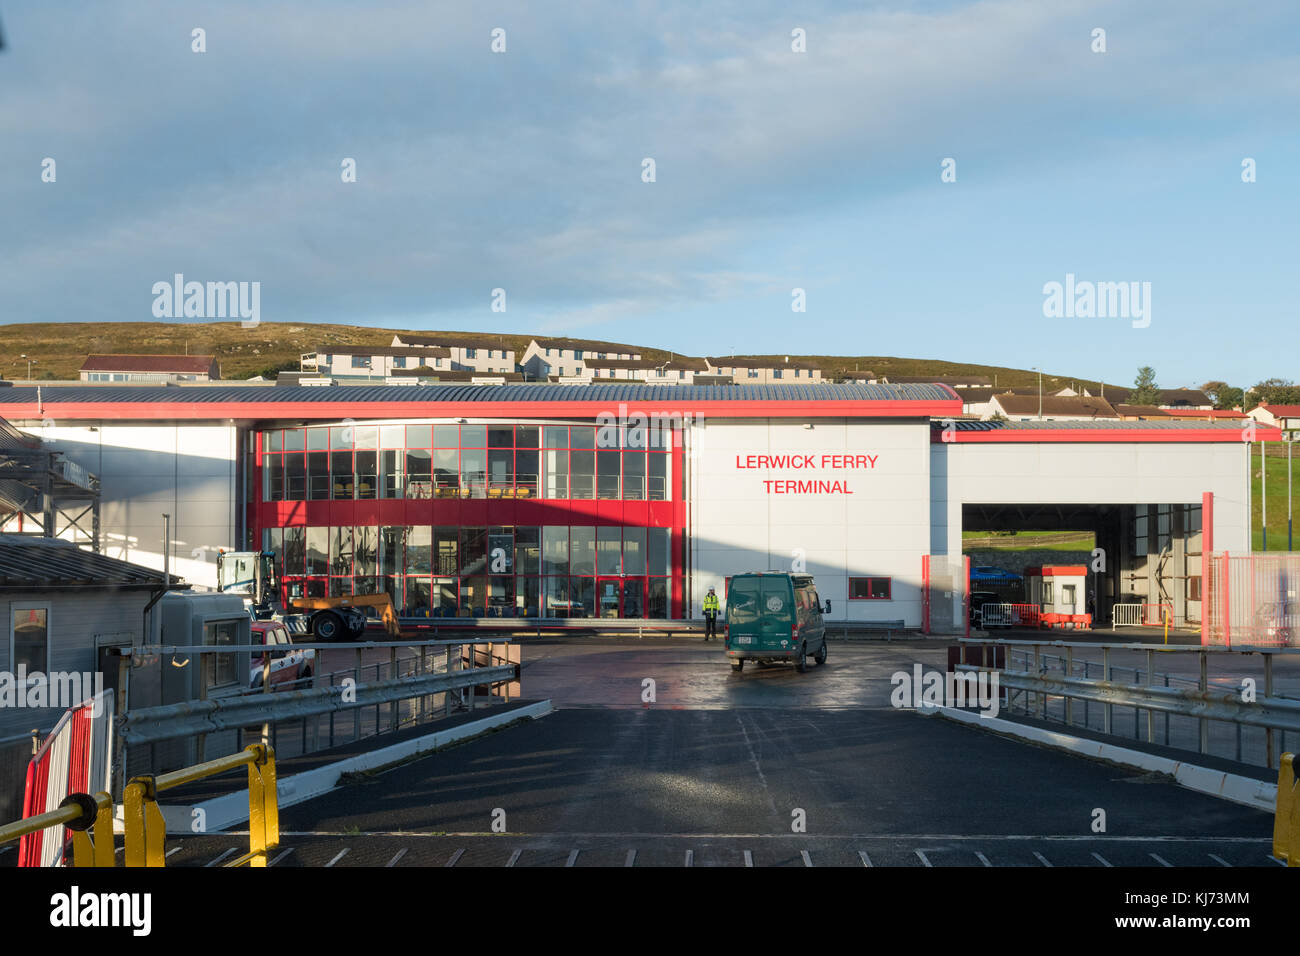 disembarking from MV Hrossey ferry at Lerwick Ferry Terminal, Shetland Islands, Scotland, UK - Stock Image